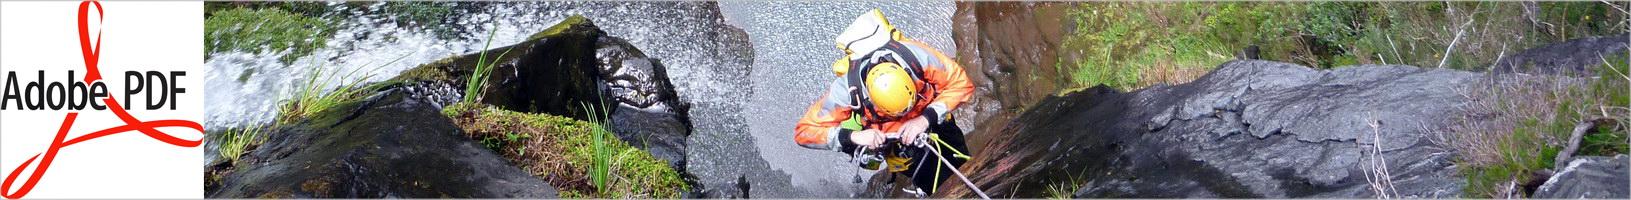 Artículo descenso de barrancos en Madeira (PT) | Revista Subterránea 22